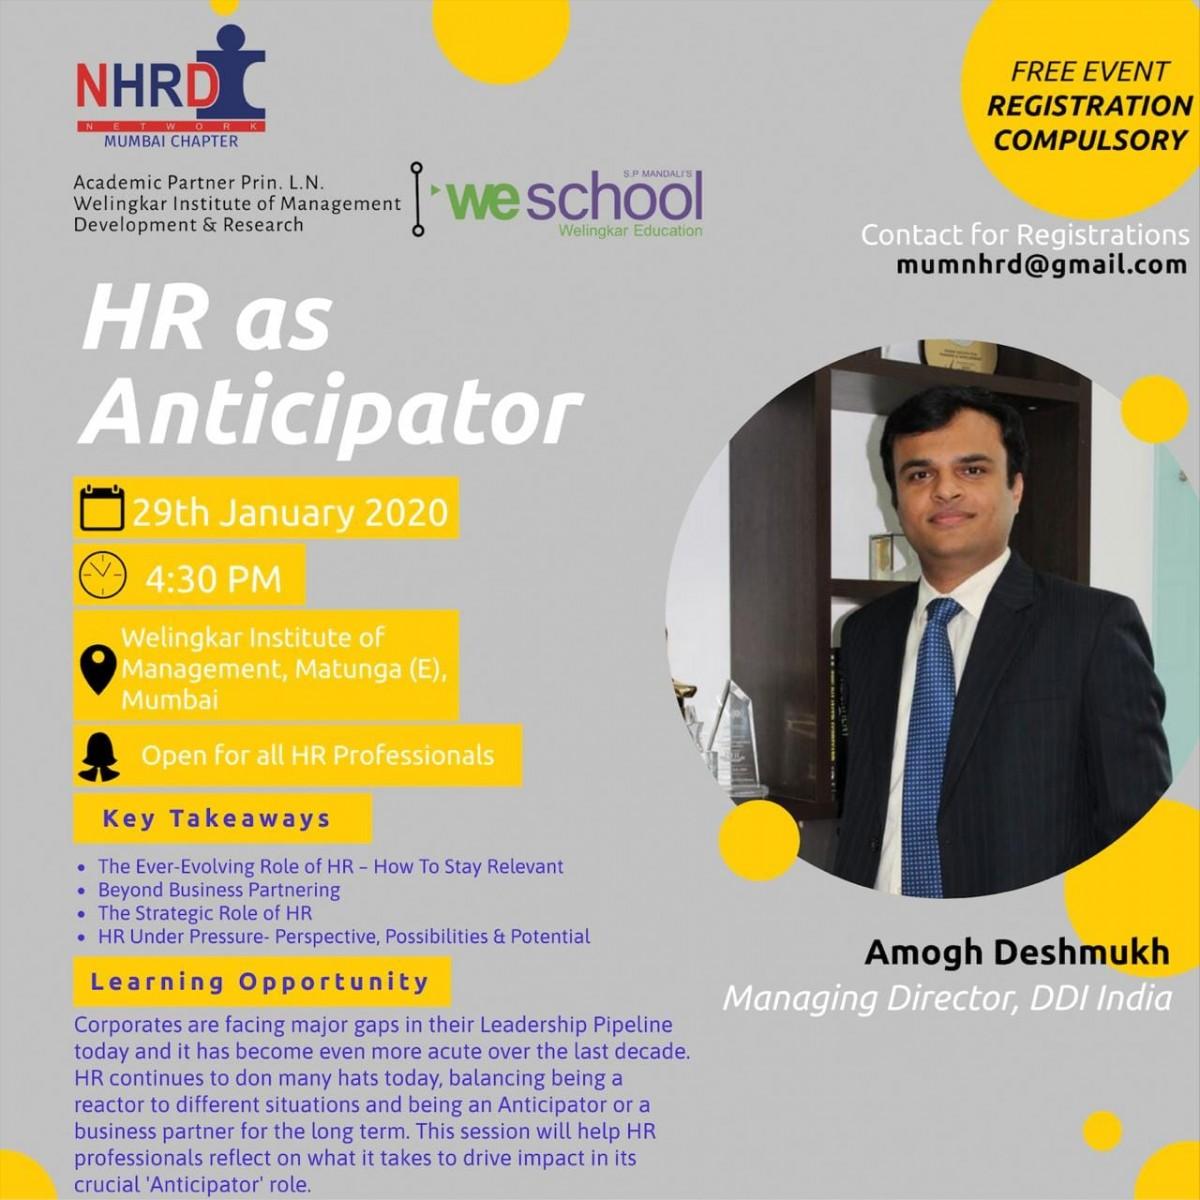 NHRDN - Mumbai Chapter Home